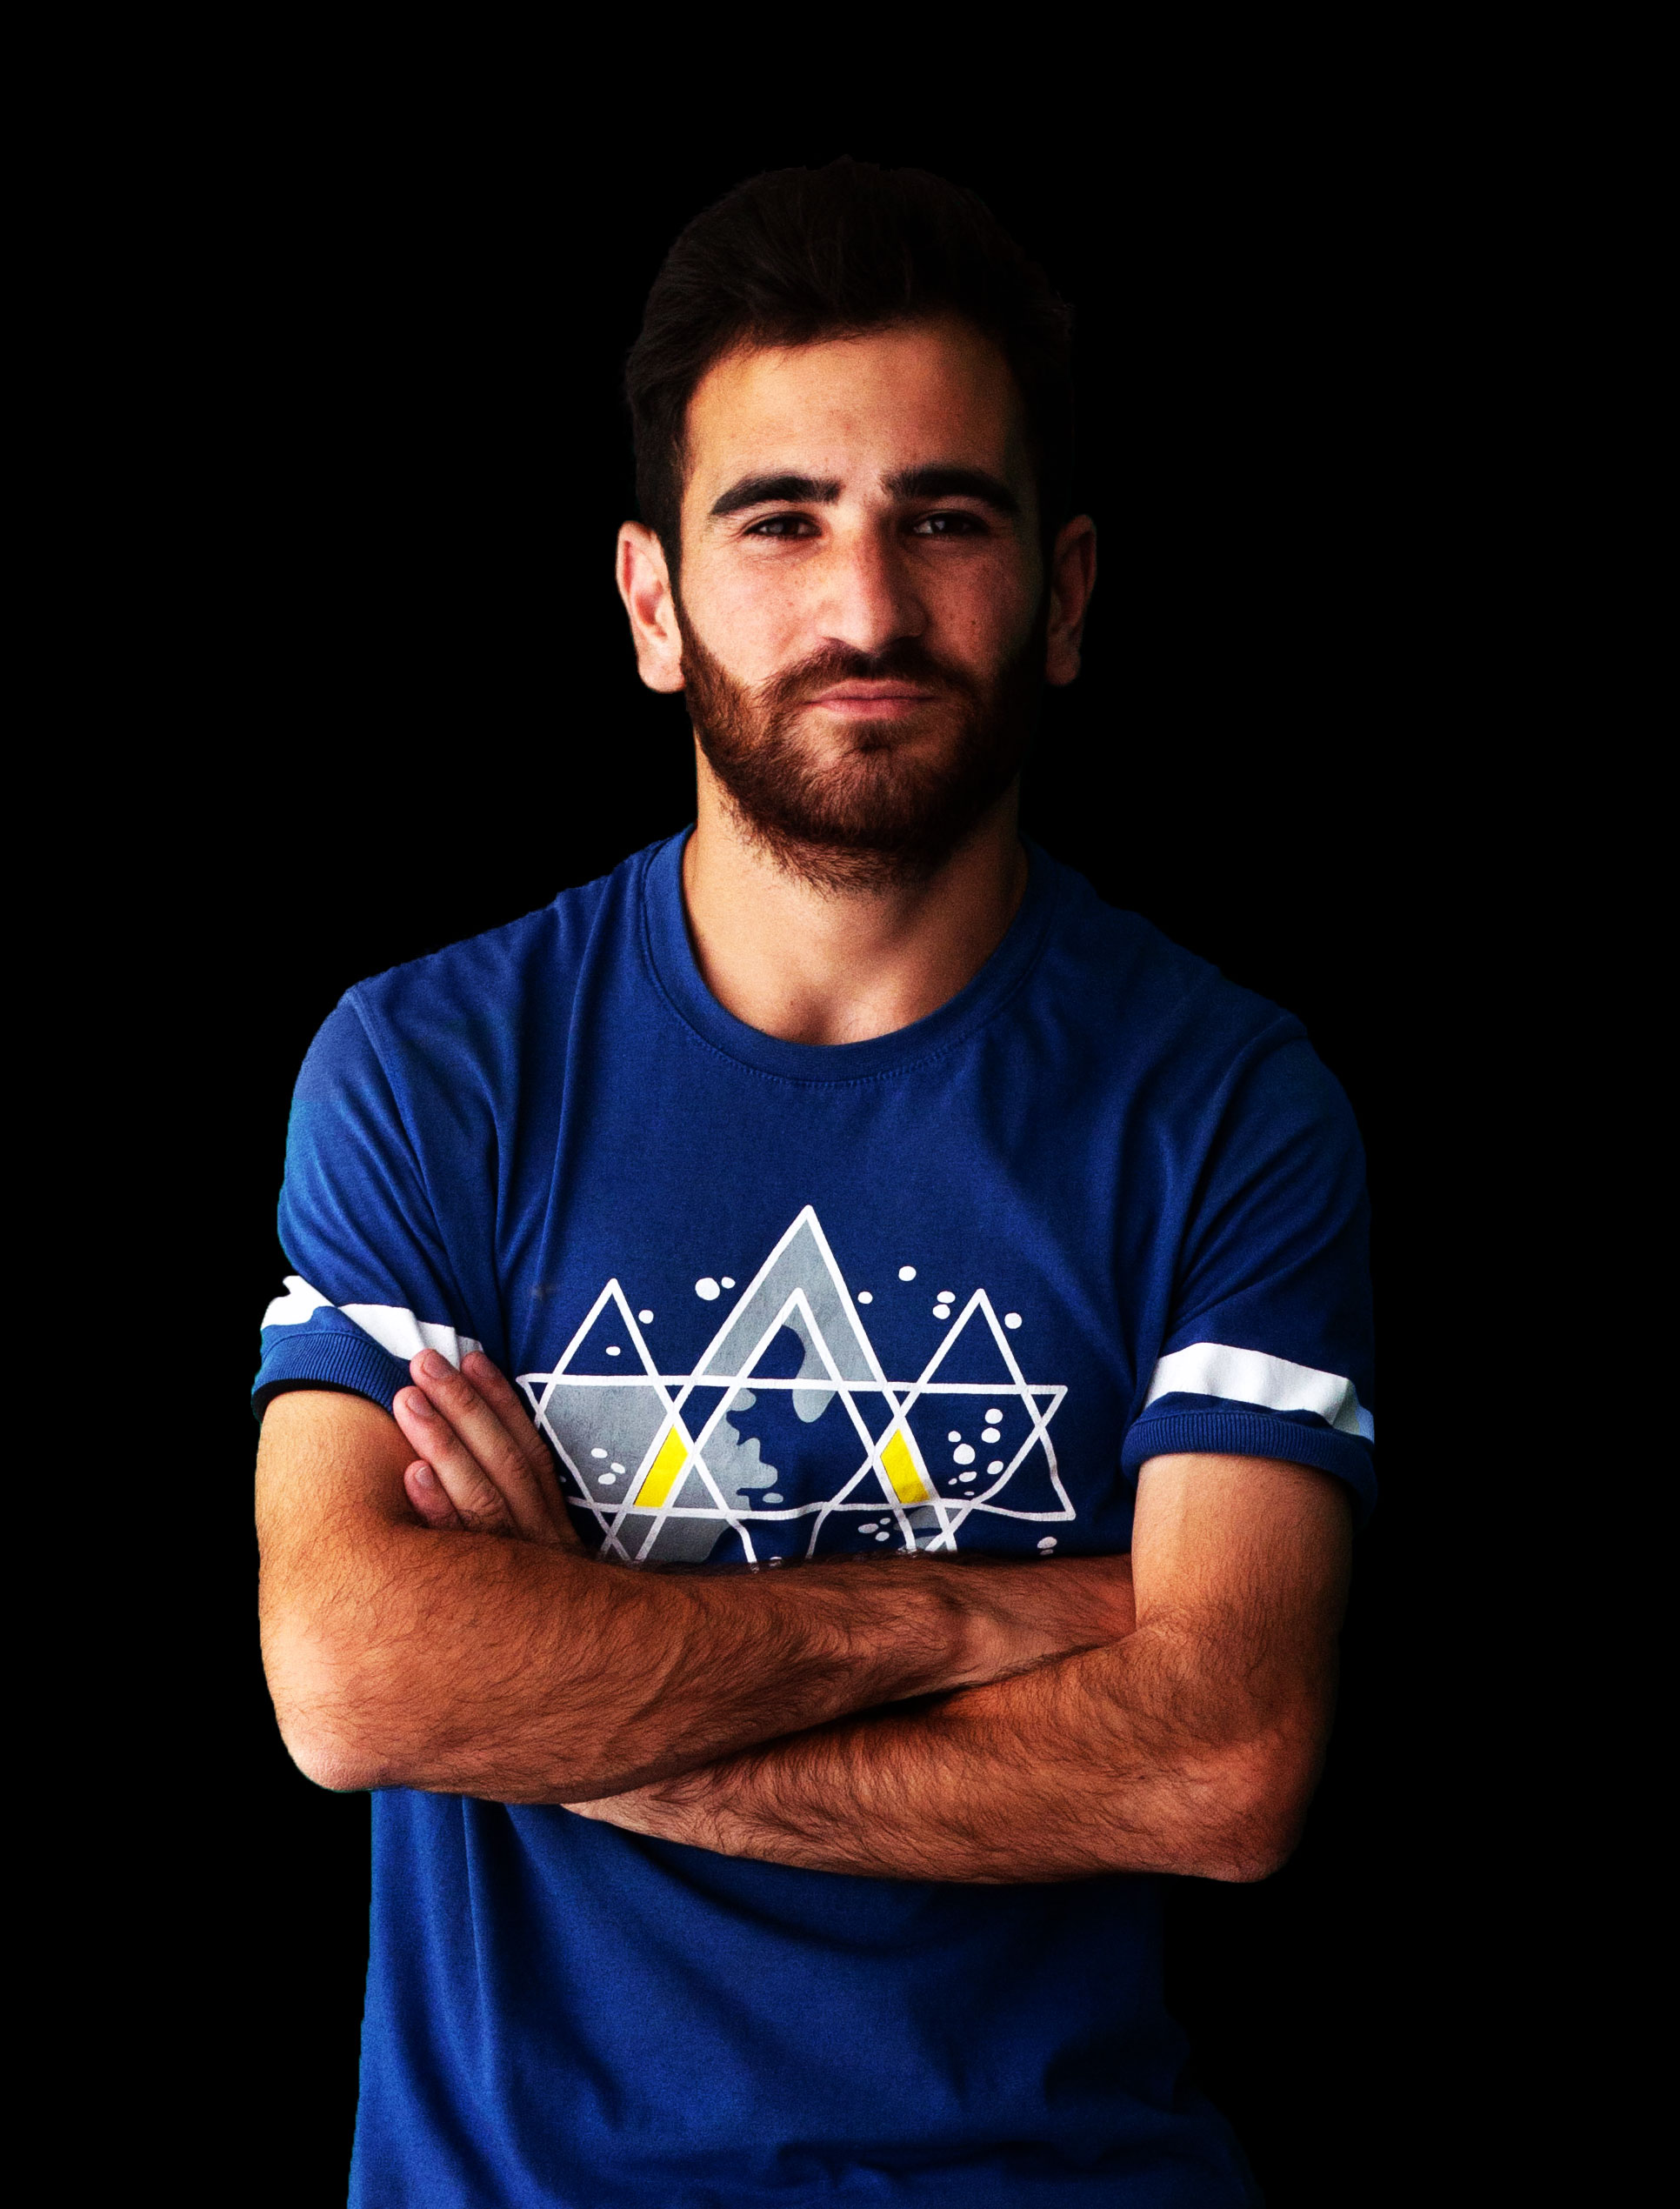 Nouman Karim After Effects, Website Design, Java, Adobe Illustrator, Full Stack Development, Google Firebase, Google Maps API, Mobile App Testing, Android, Mobile App Development